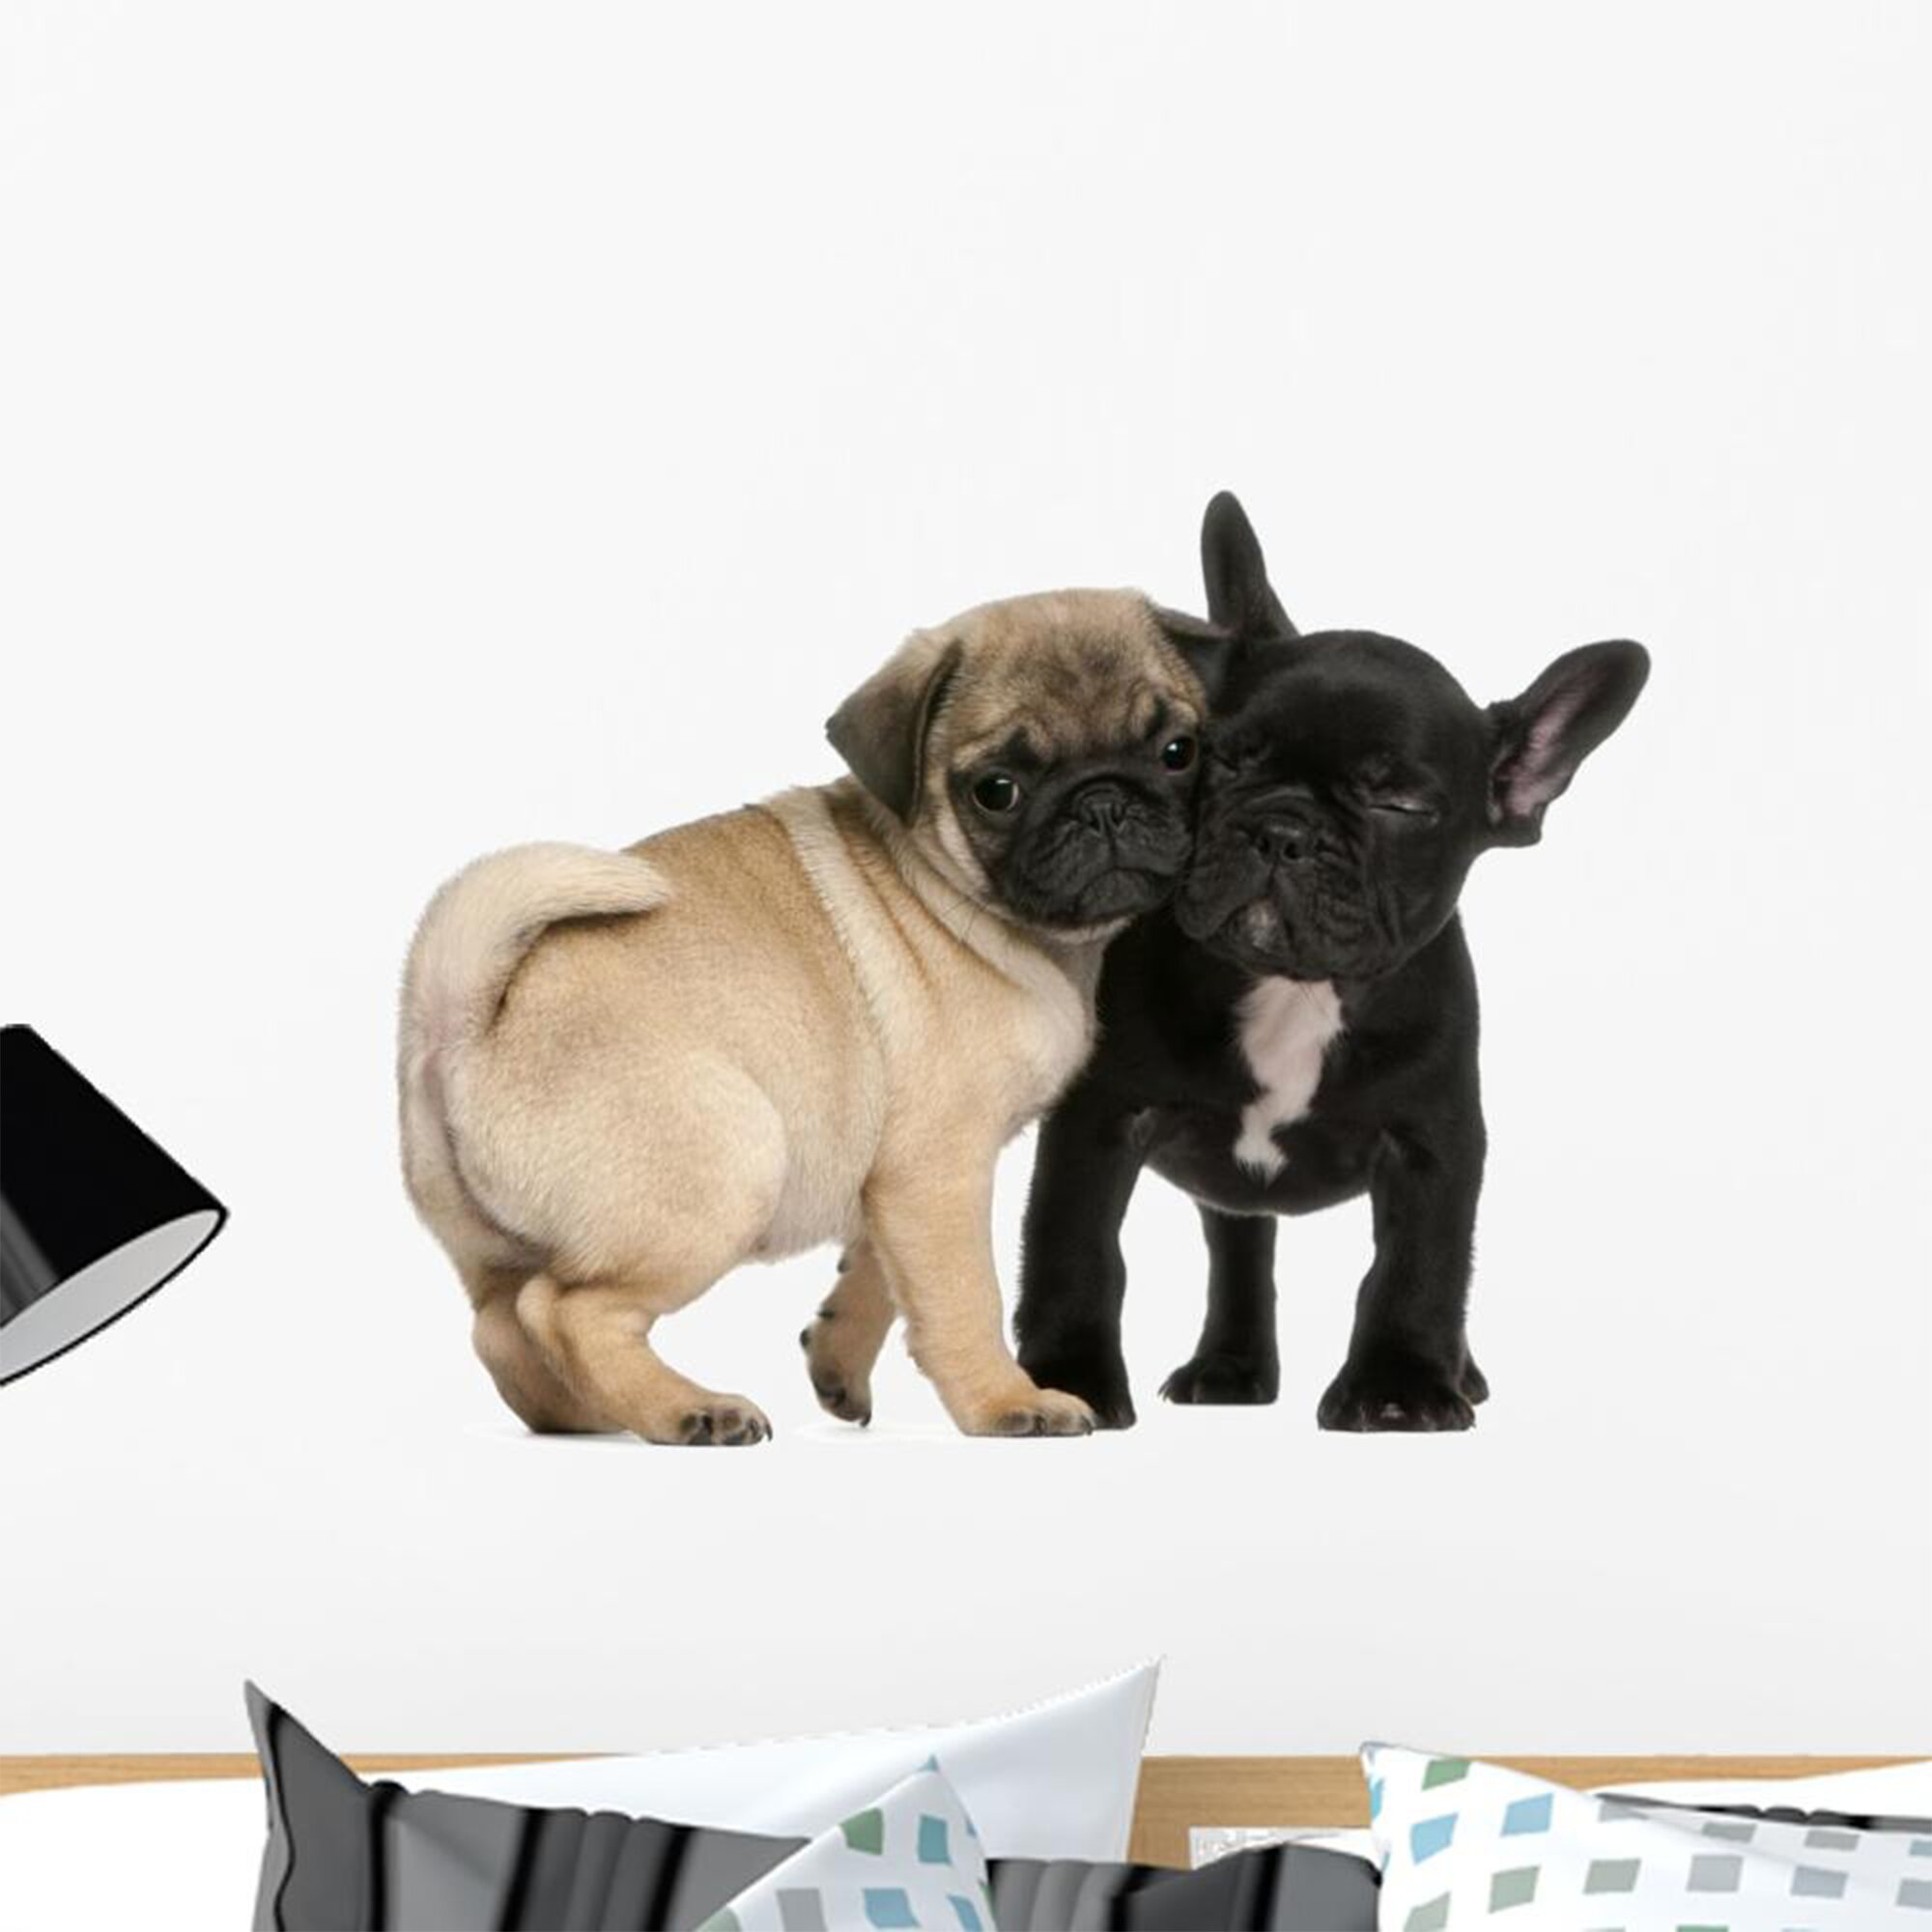 Bulldog Art Wall Decals You Ll Love In 2021 Wayfair